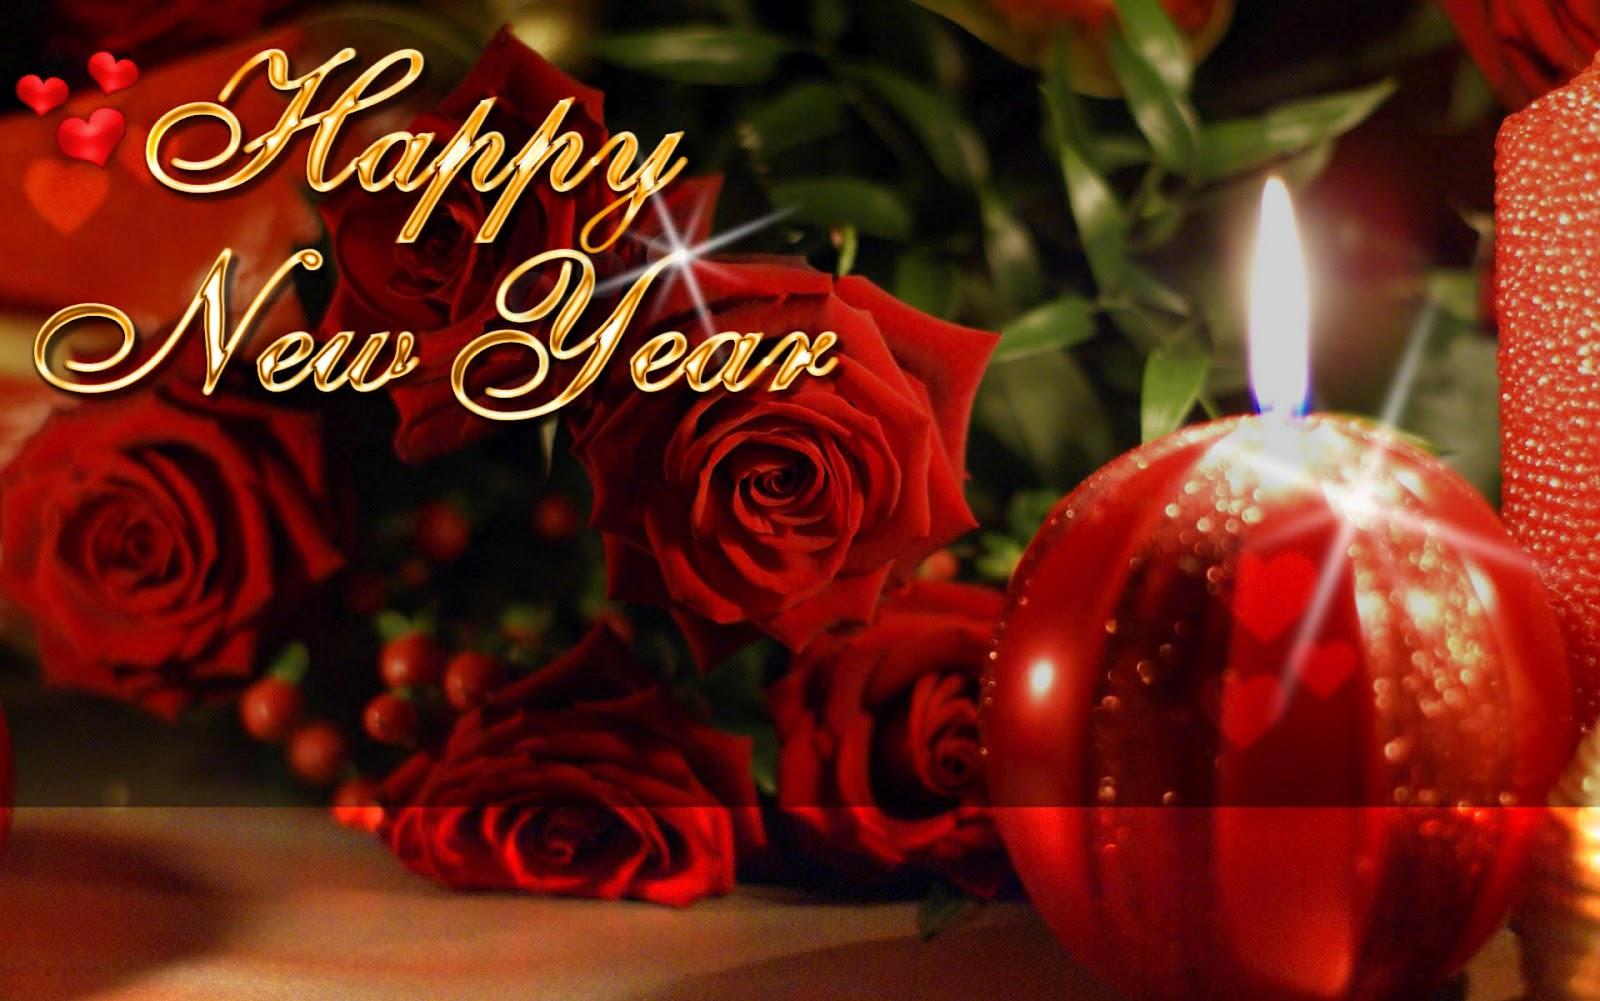 Happy New Year Latest Wallpapers 2013 | 5abi Songs,Latest Punjabi ...